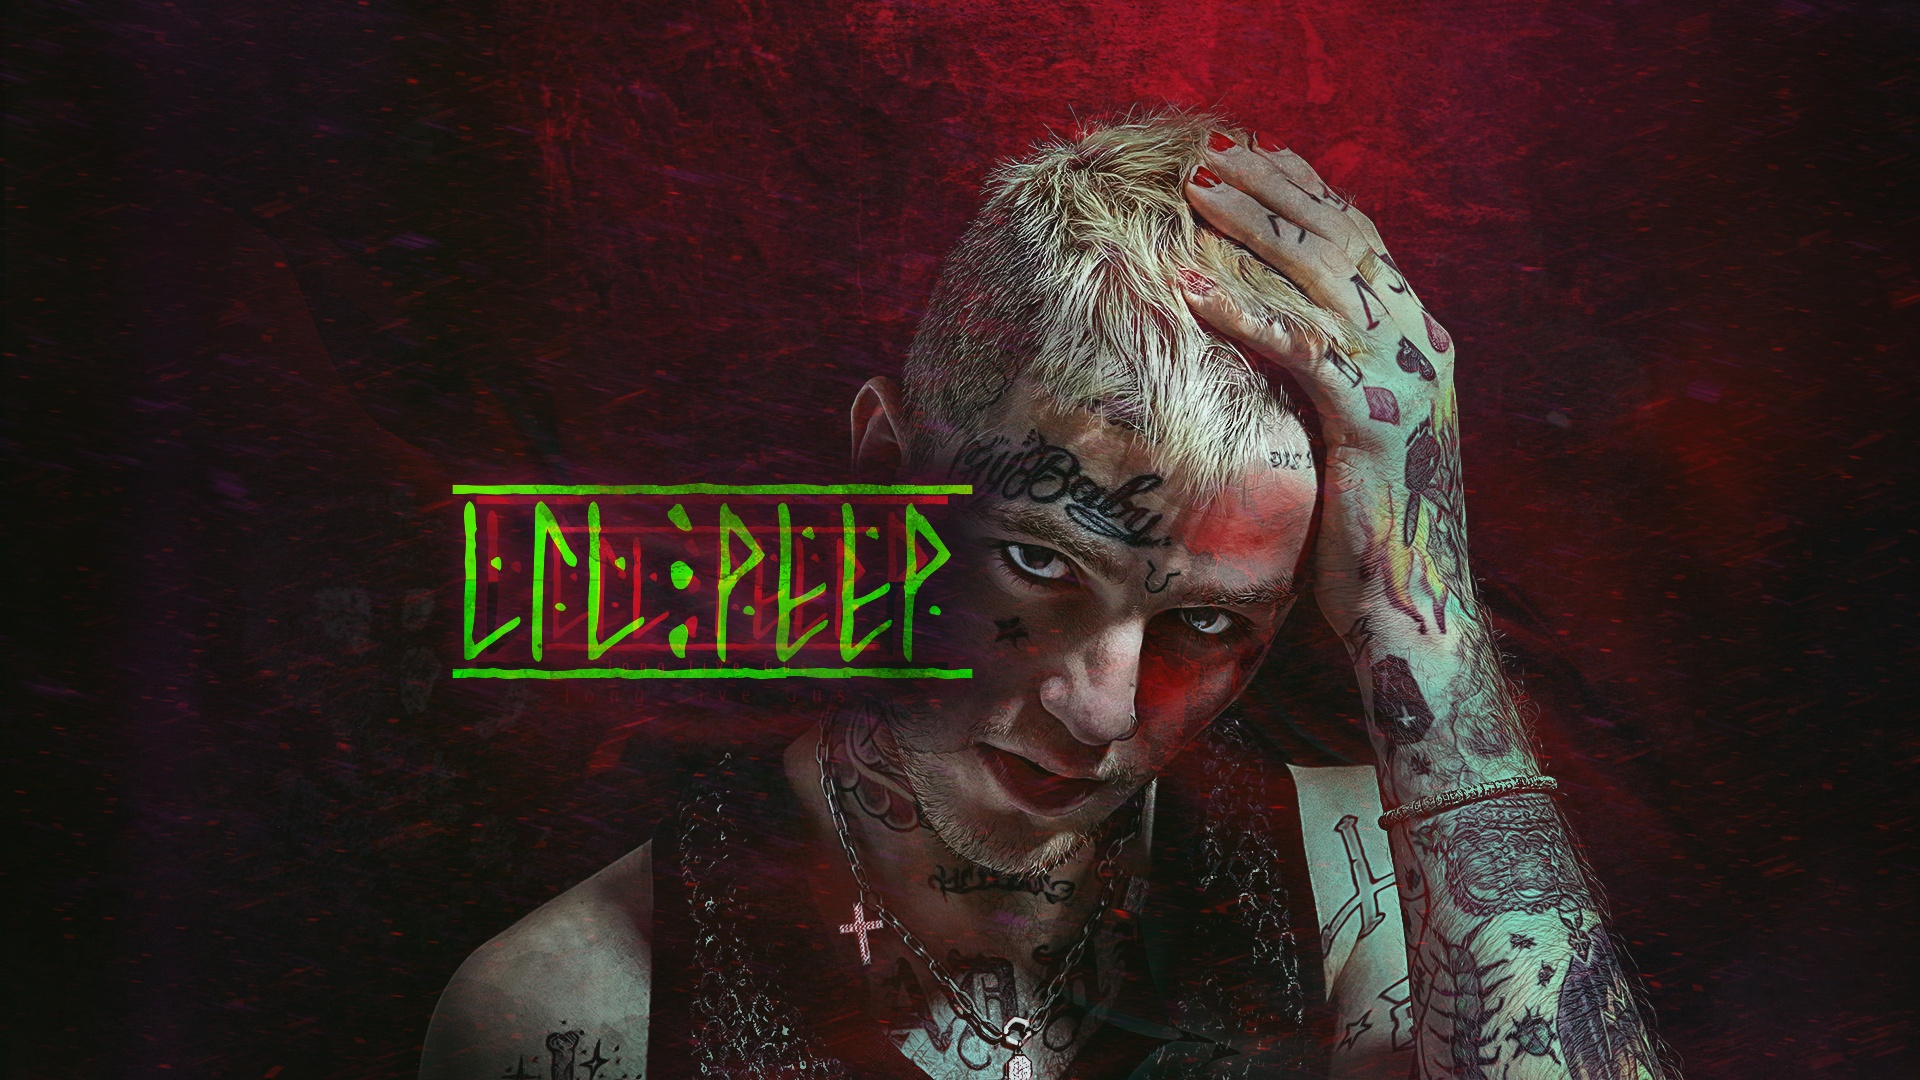 Lil Peep 1080p wallpaper